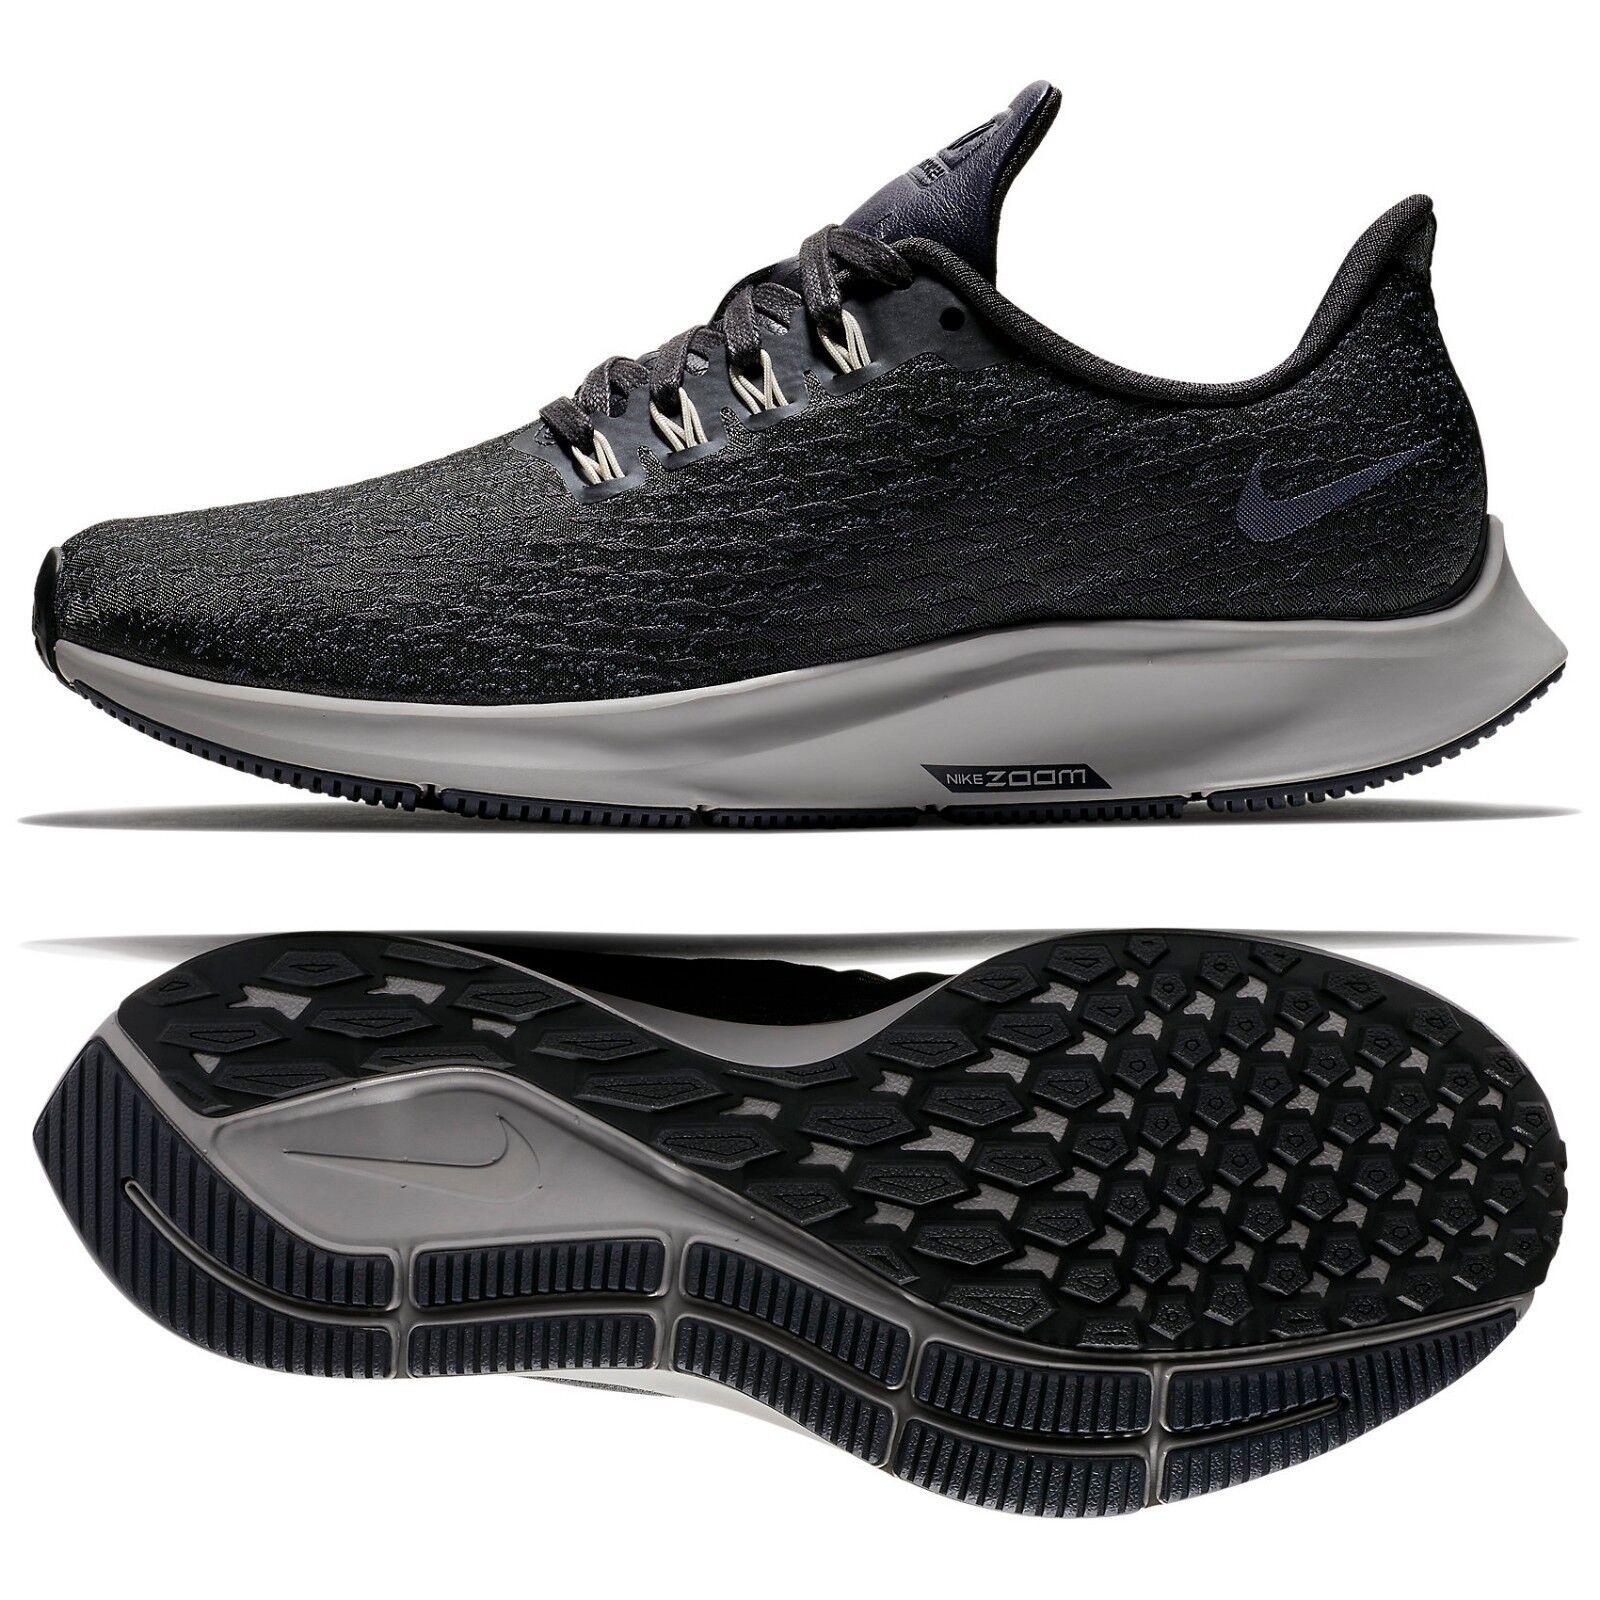 Nike W Air Zoom Pegasus 35 AH8392-001 Grey/Gridiron/Carbon Women's Running Shoes Brand discount